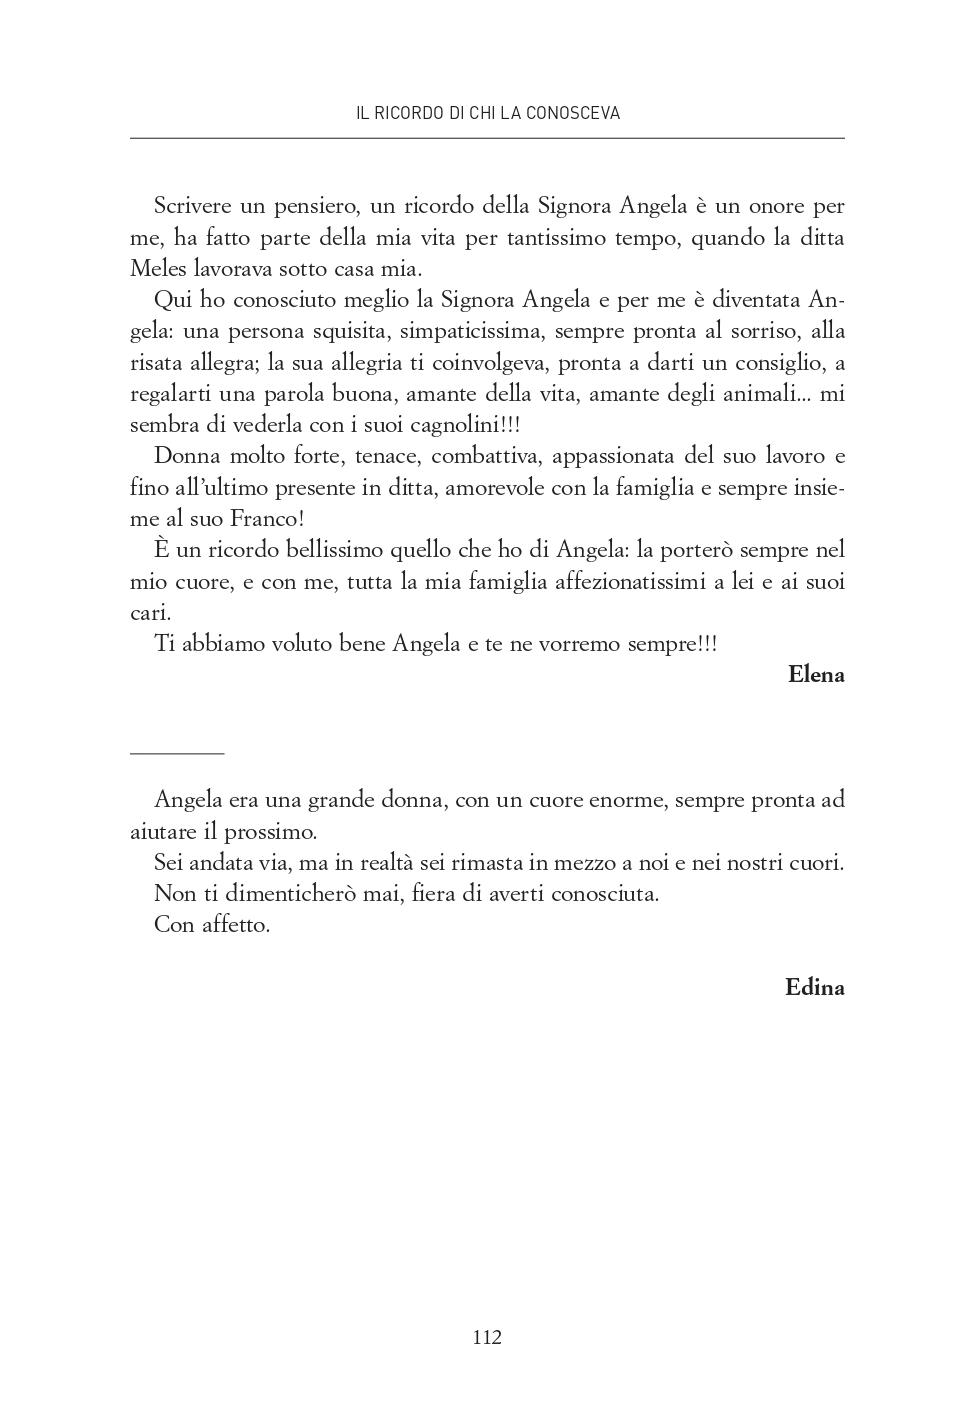 Libro MELES_200 pag_165x240 cm_Febbraio 2021_light_compressed_page-0113